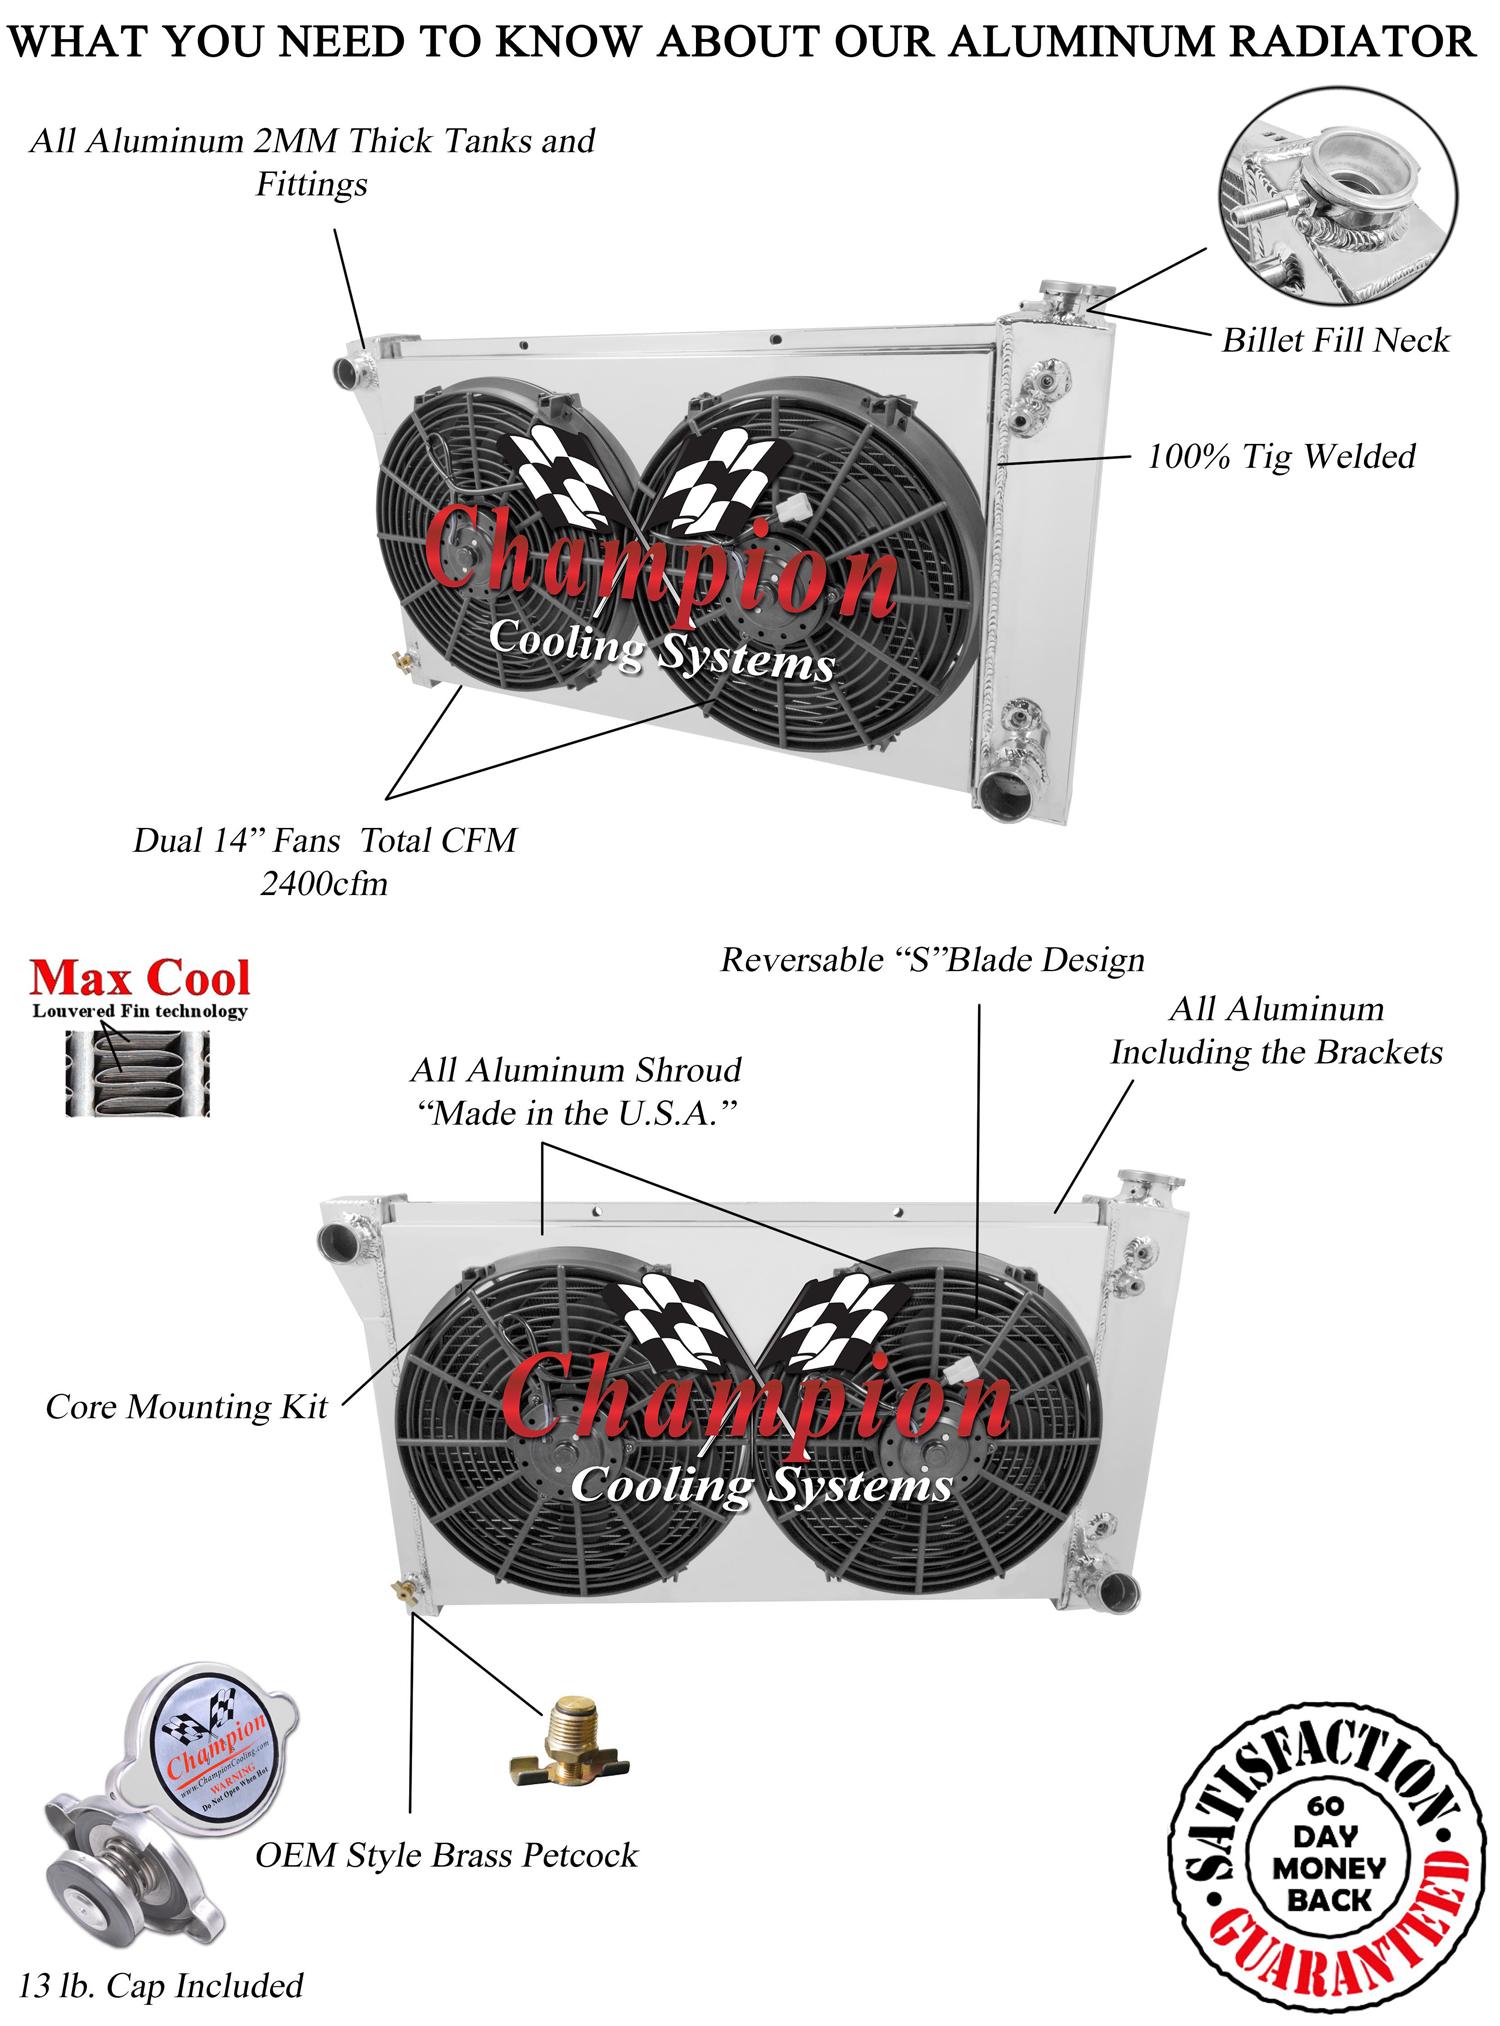 67 72 chevy c10 c20 k10 k20 k30 2 row dr champion radiator fan 67 68 69 70 71 72 chevy c10 c20 k10 k20 k30 2 row champion radiator